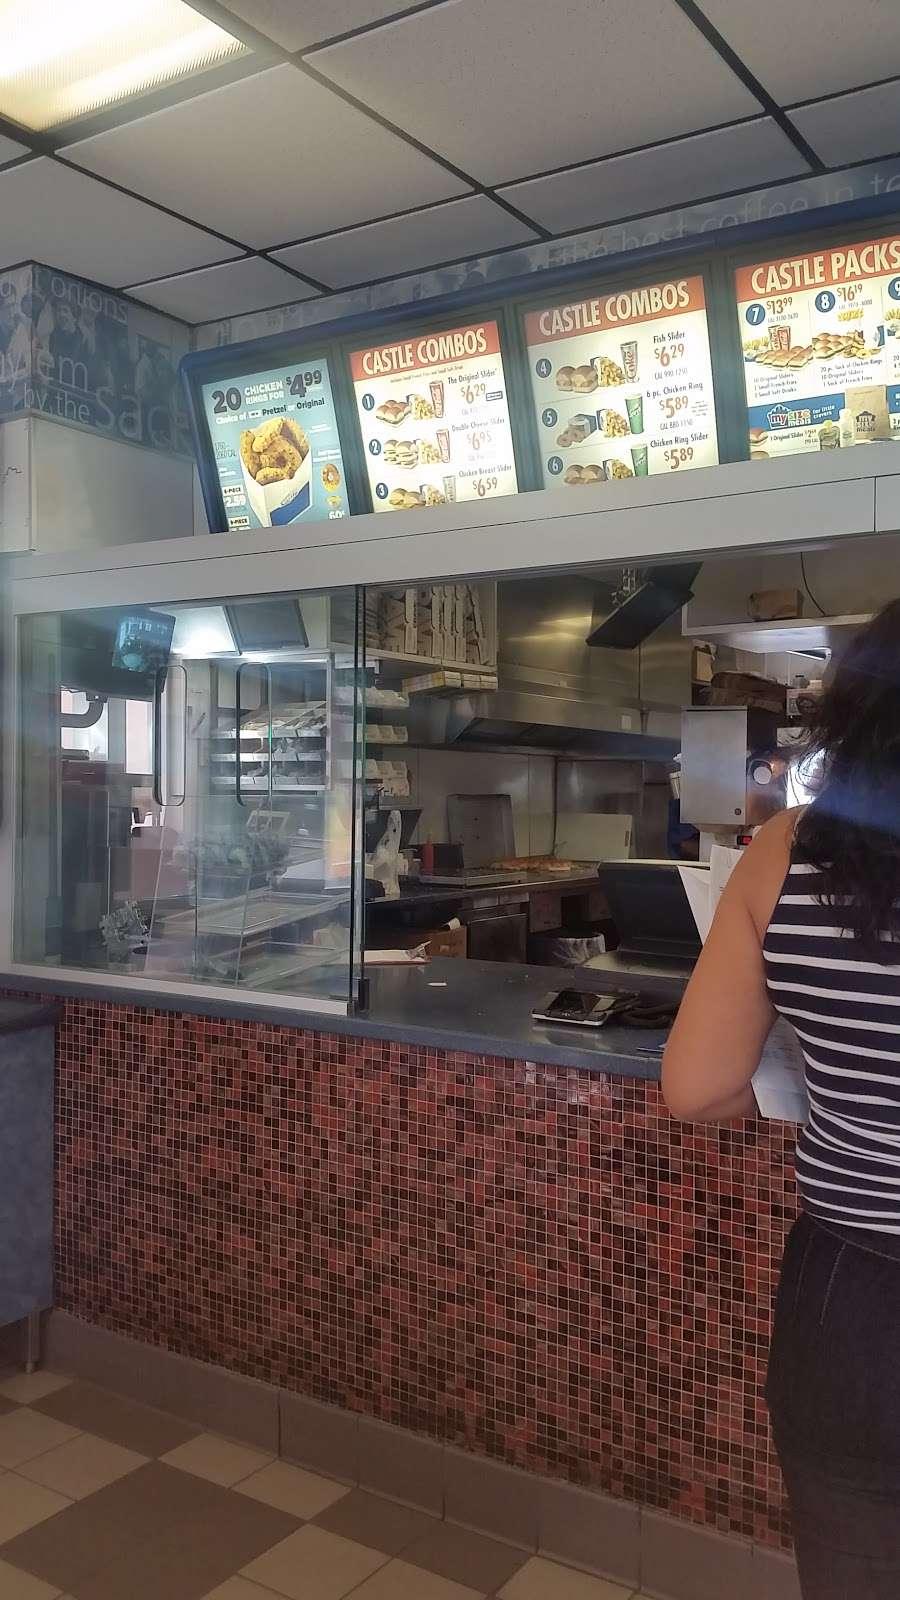 White Castle - restaurant  | Photo 4 of 10 | Address: 351 E 103rd St, New York, NY 10029, USA | Phone: (212) 876-6737